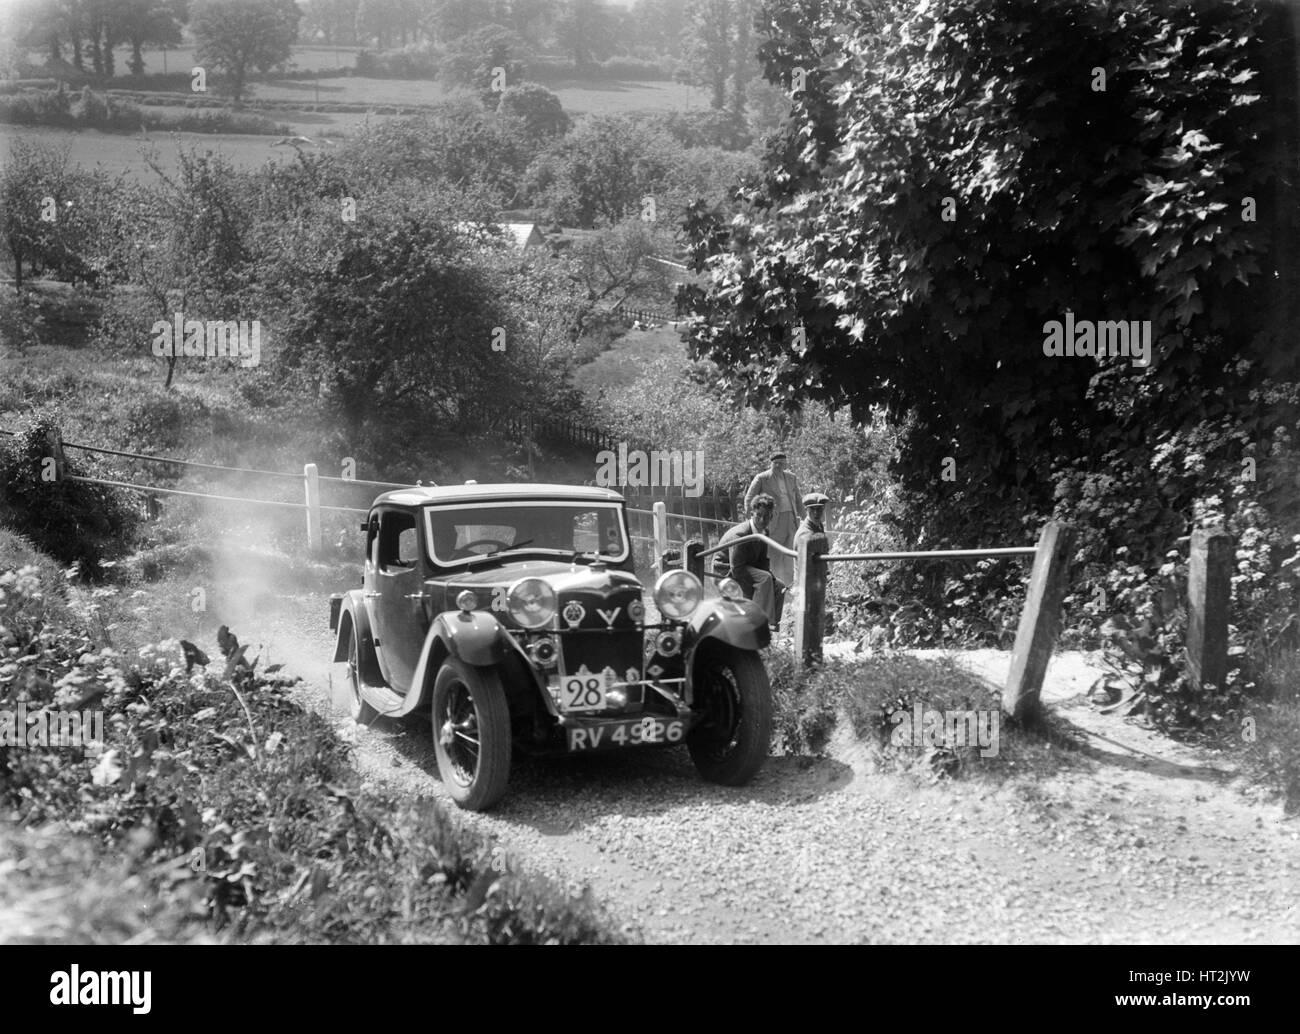 1934 Riley Kestrel taking part in a West Hants Light Car Club Trial, Ibberton Hill, Dorset, 1930s. Artist: Bill - Stock Image